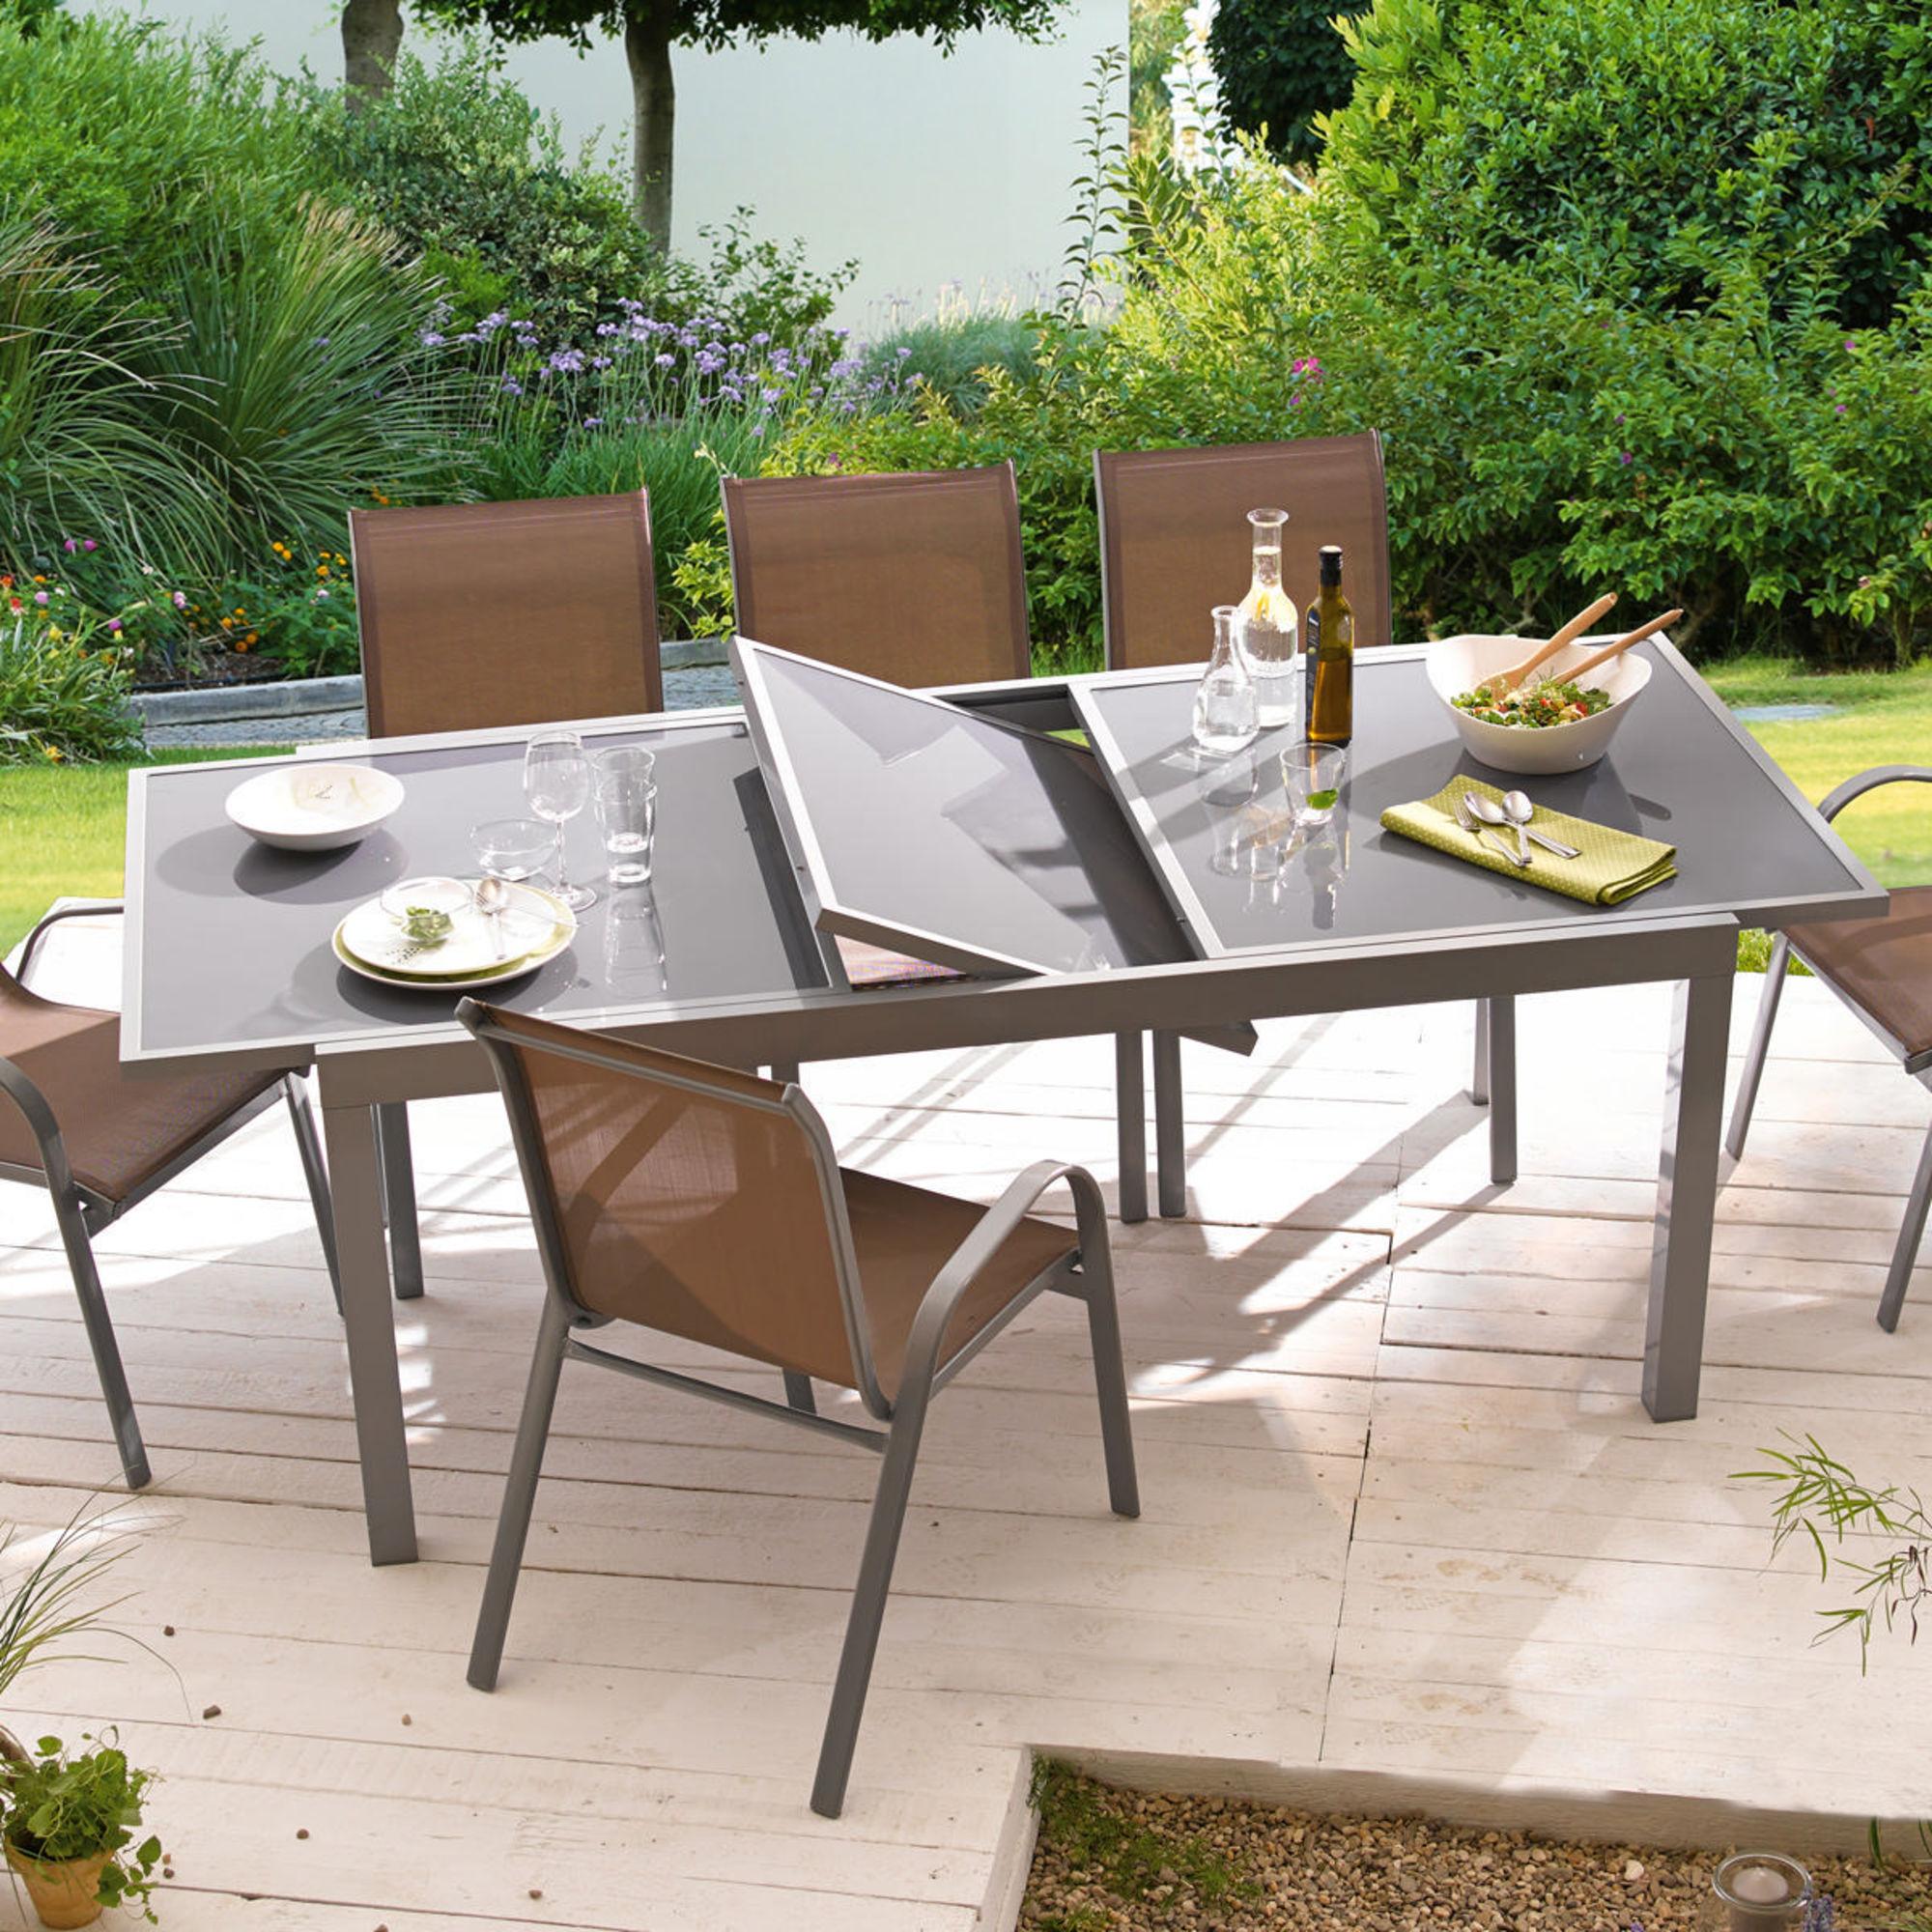 Relativ Gartentisch Futura, ausziehbar, Aluminium OQ52